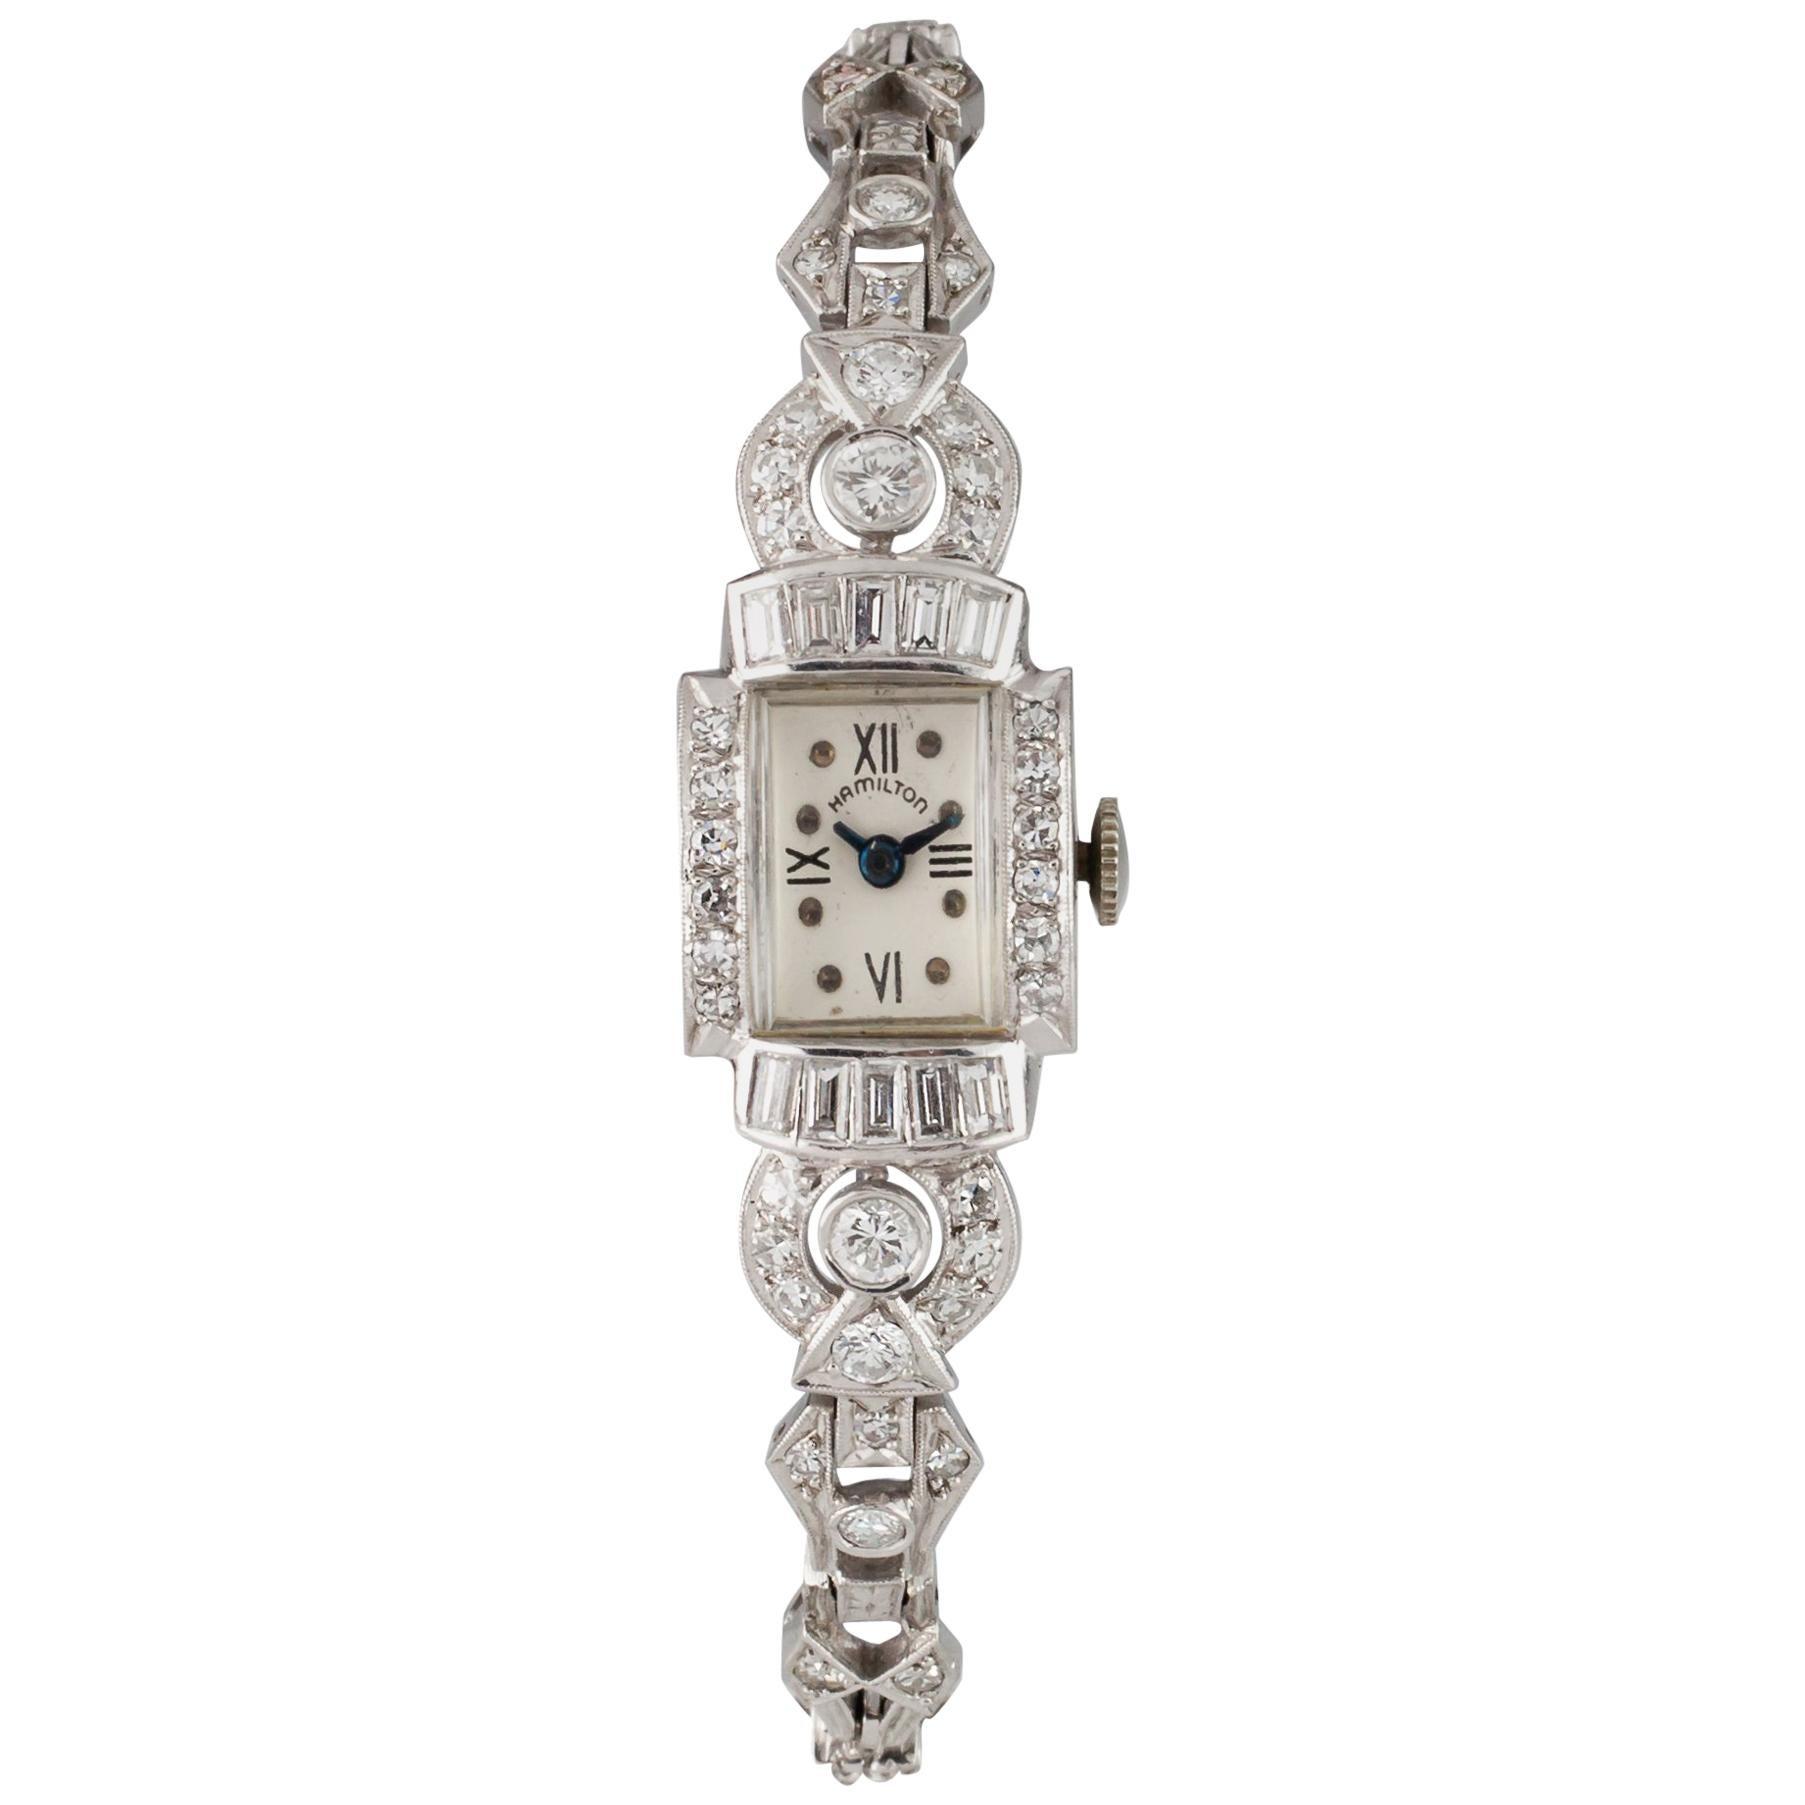 Hamilton Platinum Diamond Women's Mechanical Hand-Winding Art Deco Watch